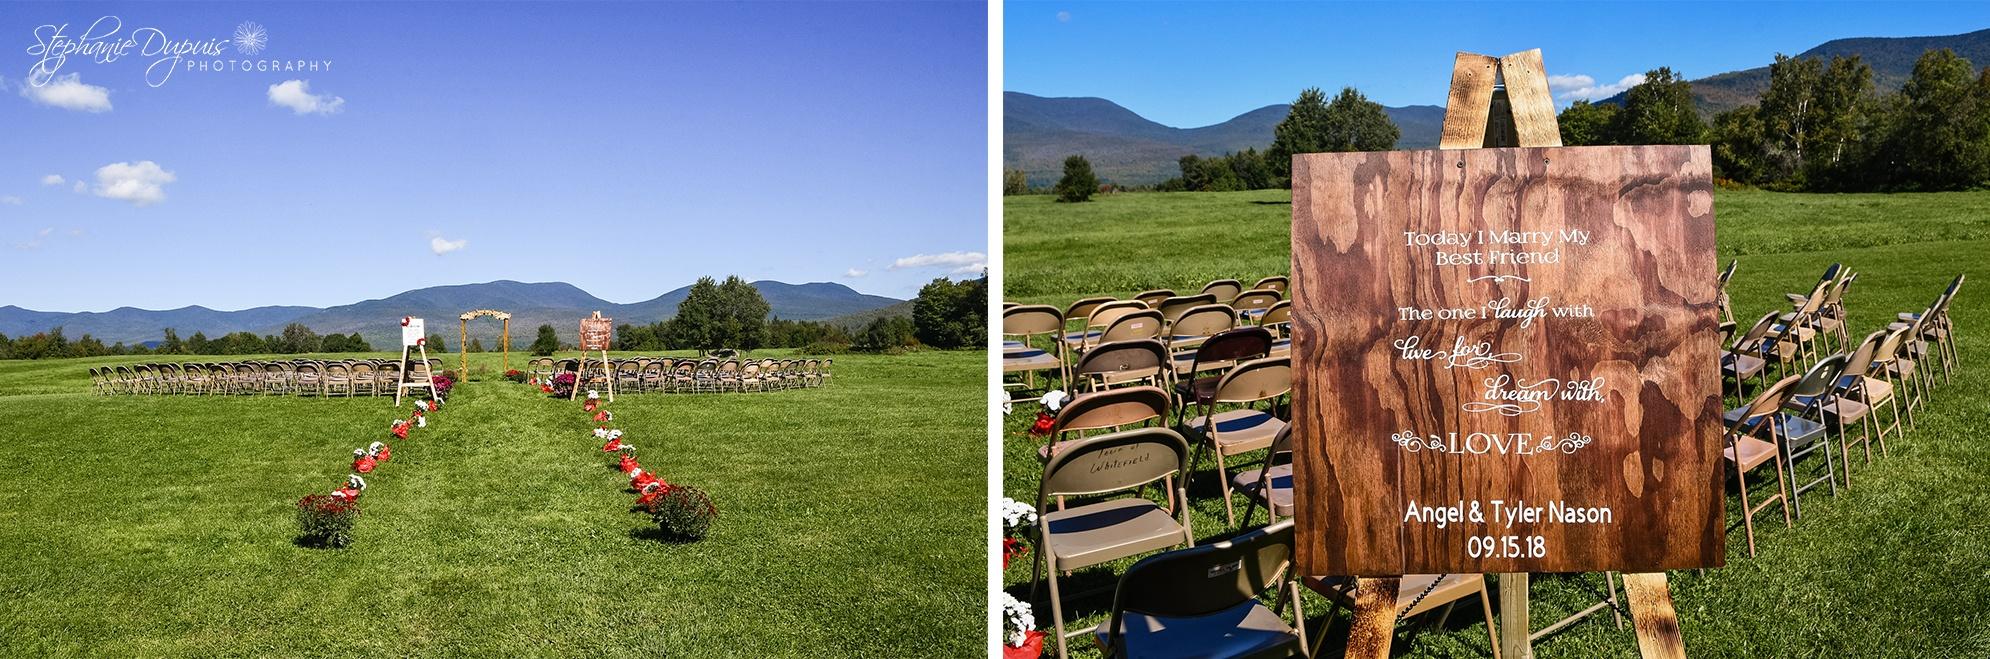 Lancaster Wedding Photographer 01 2 - Portfolio: Brown Wedding